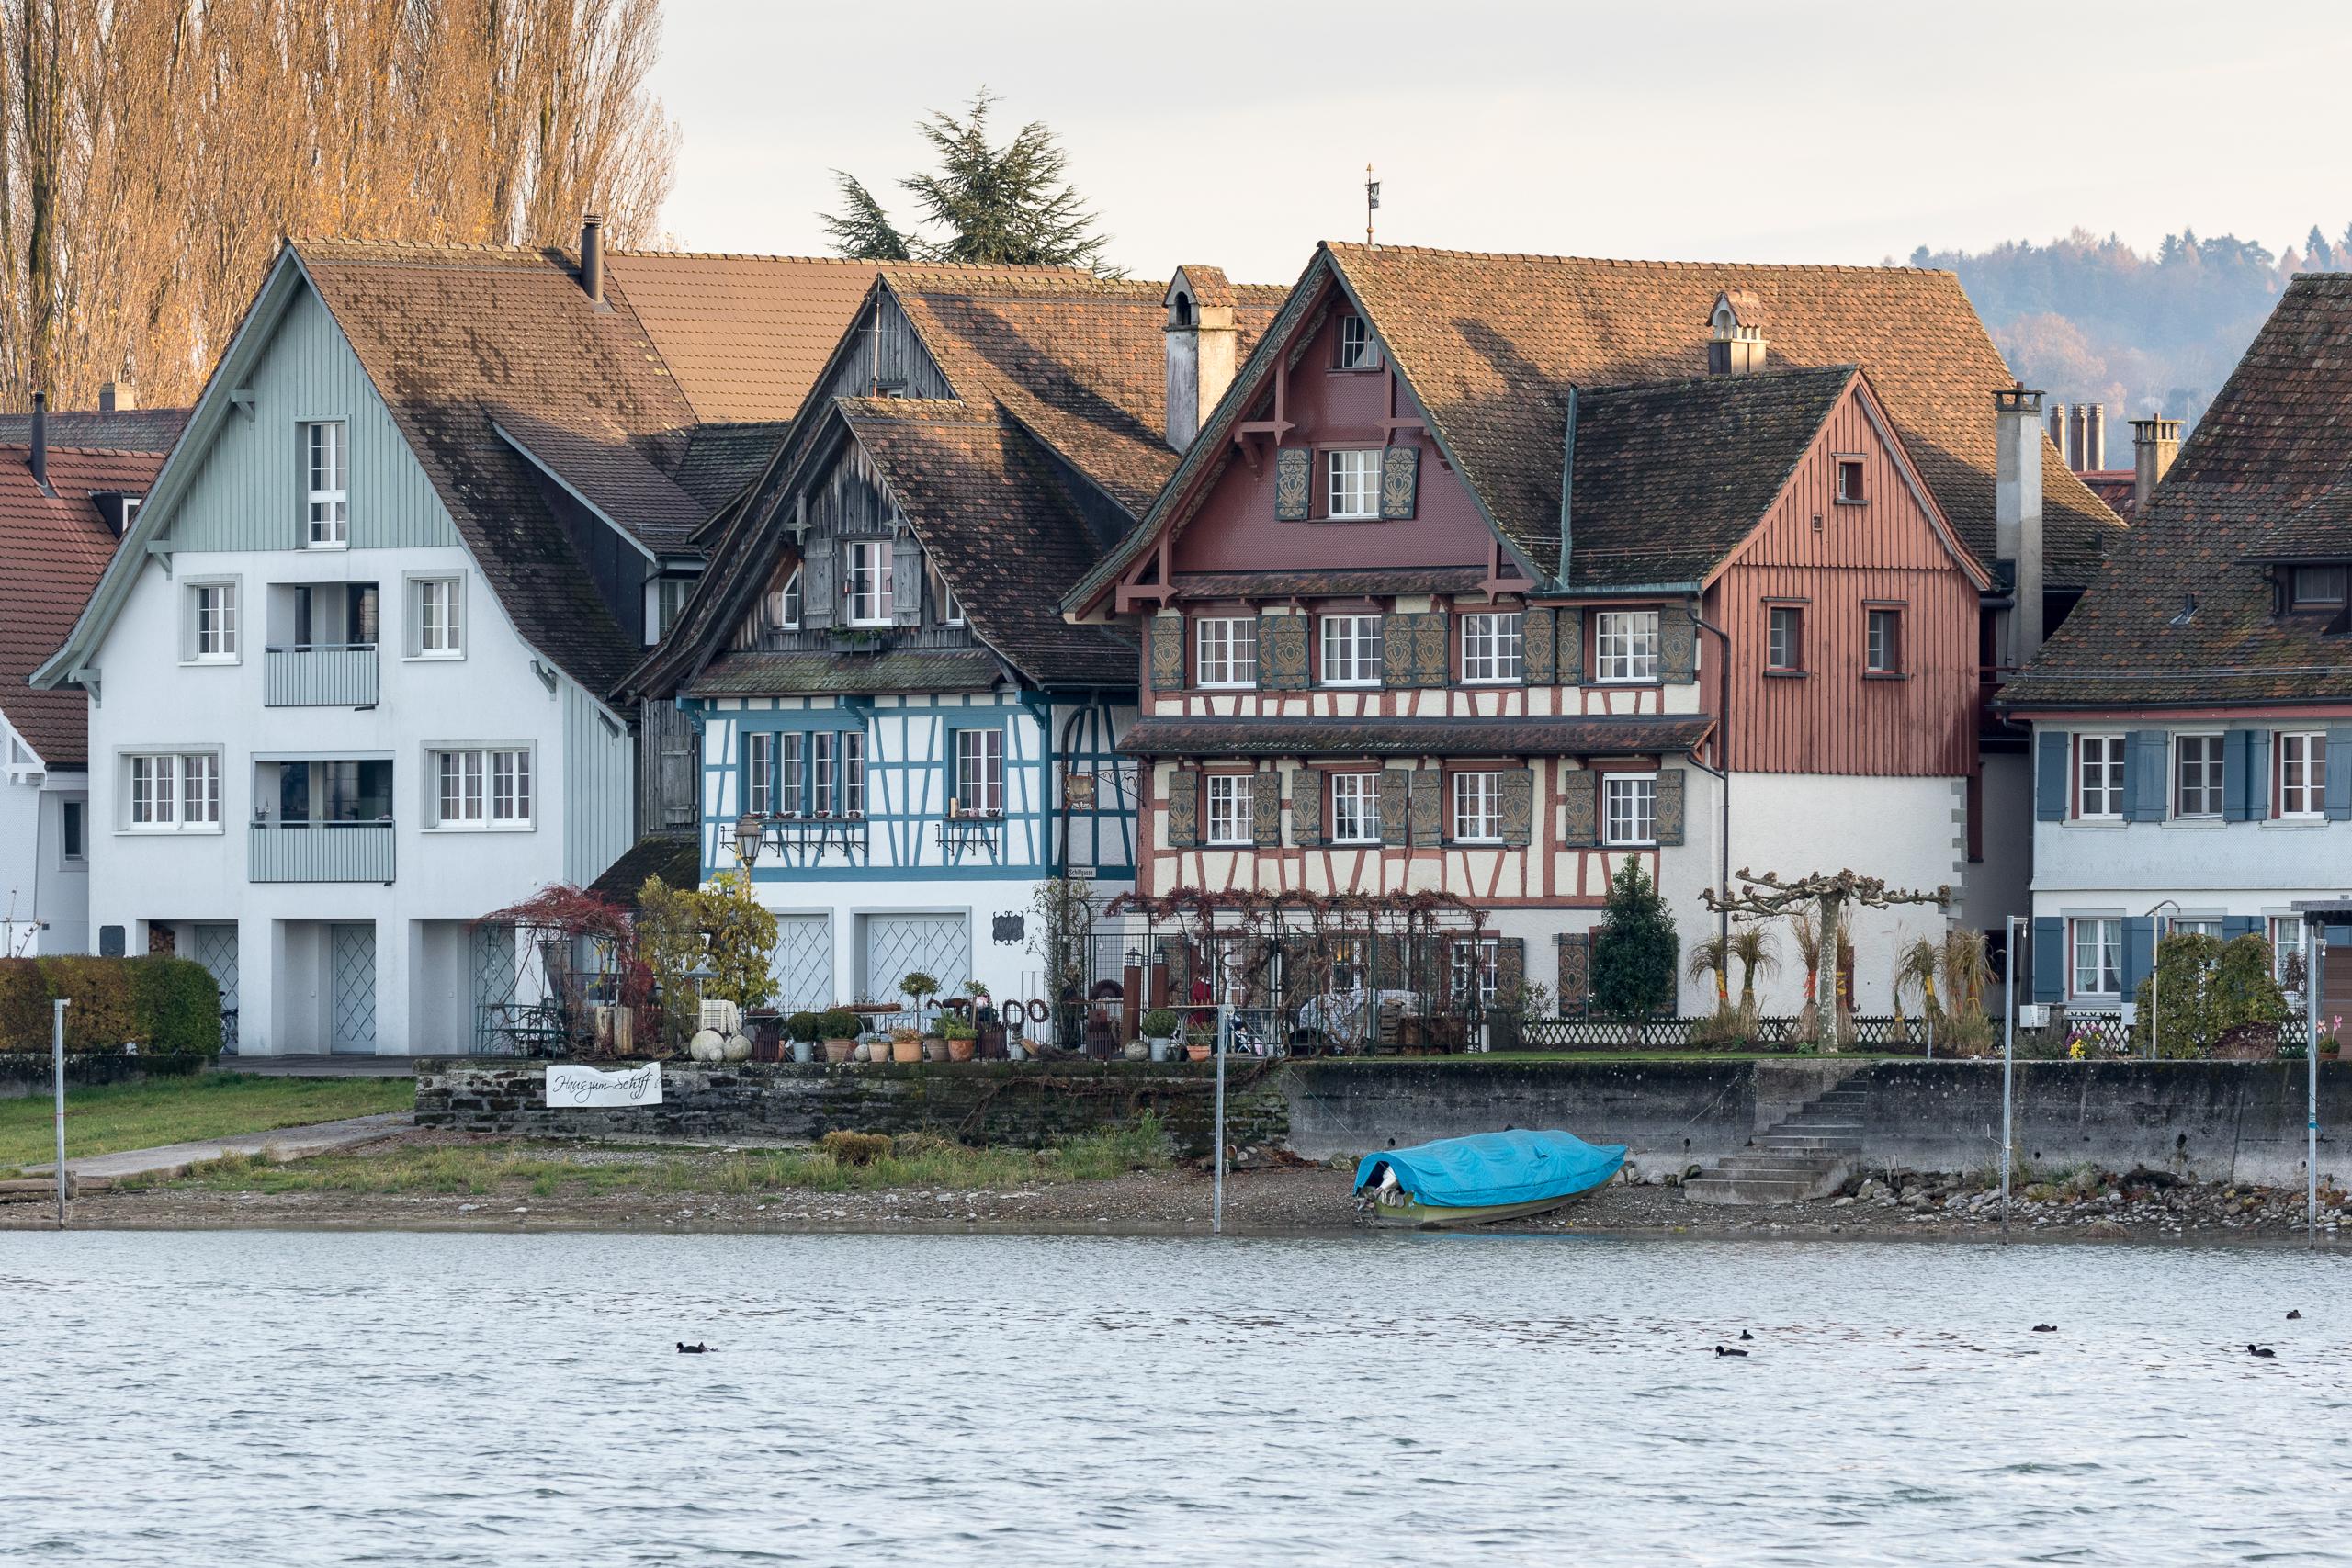 Datei:Ermatingen TG - Häuser an der Oberen Seestrasse.jpg – Wikipedia